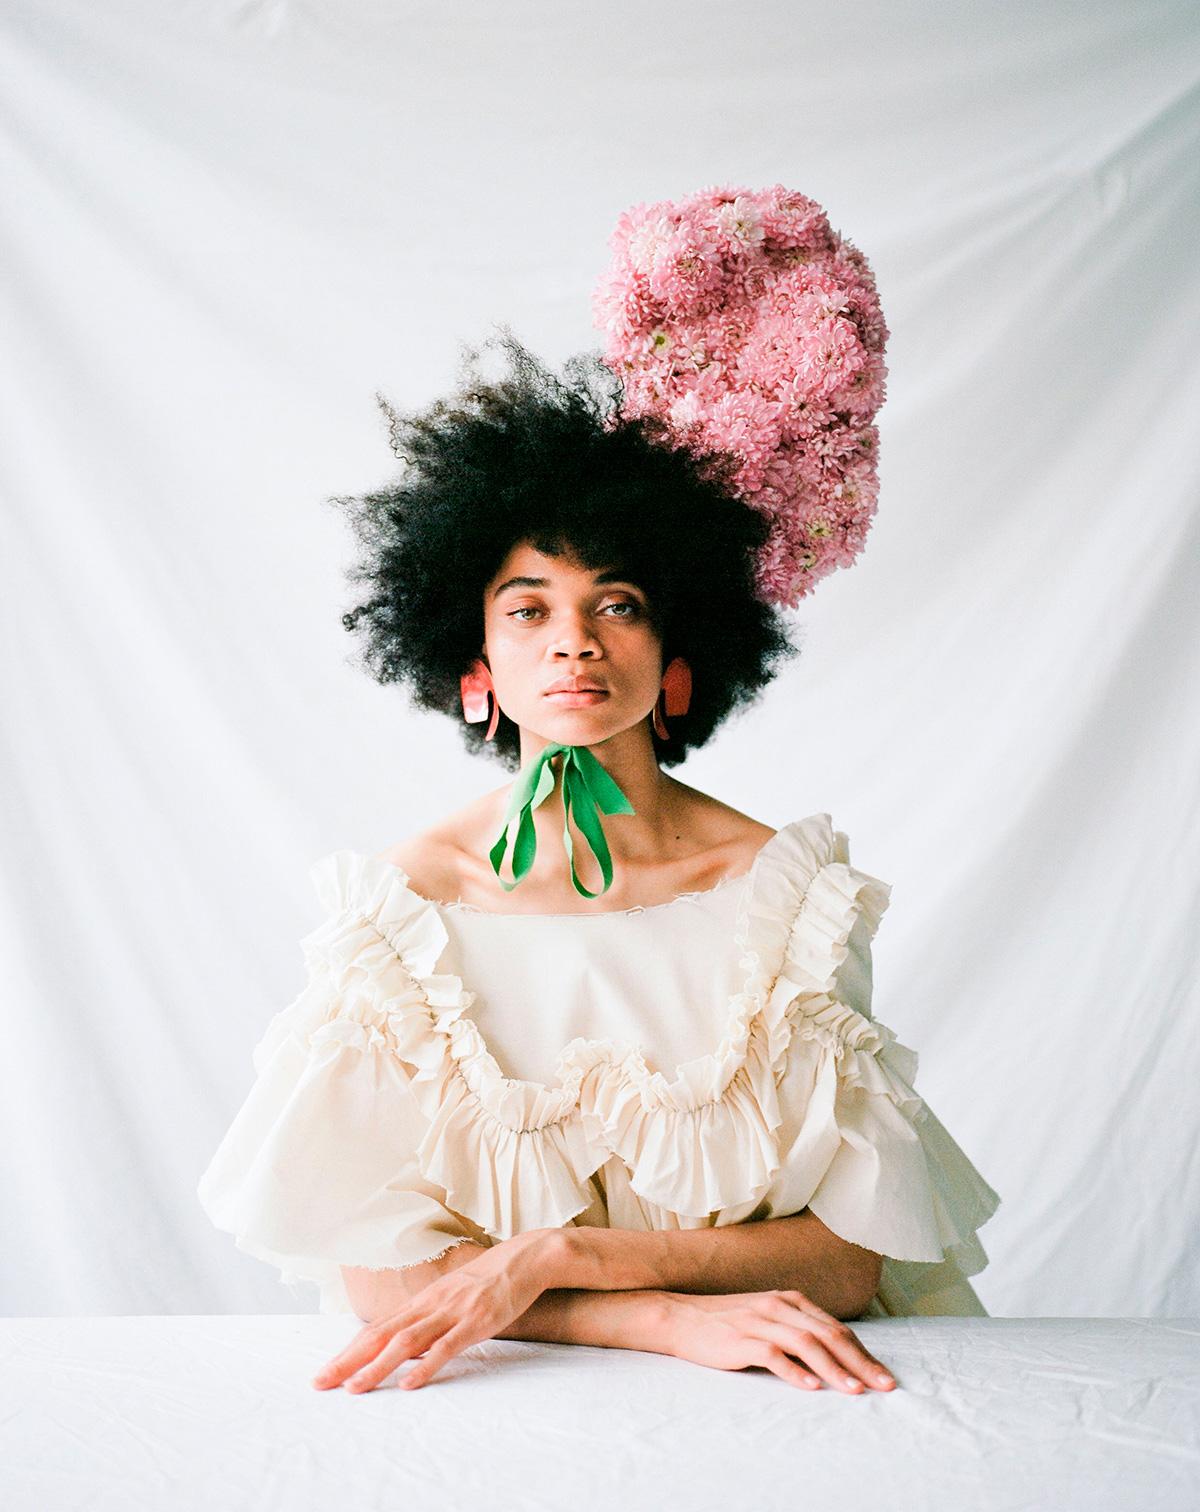 teeth magazine fashion editorial featuring kelsey randall muslin ruffle angel dress